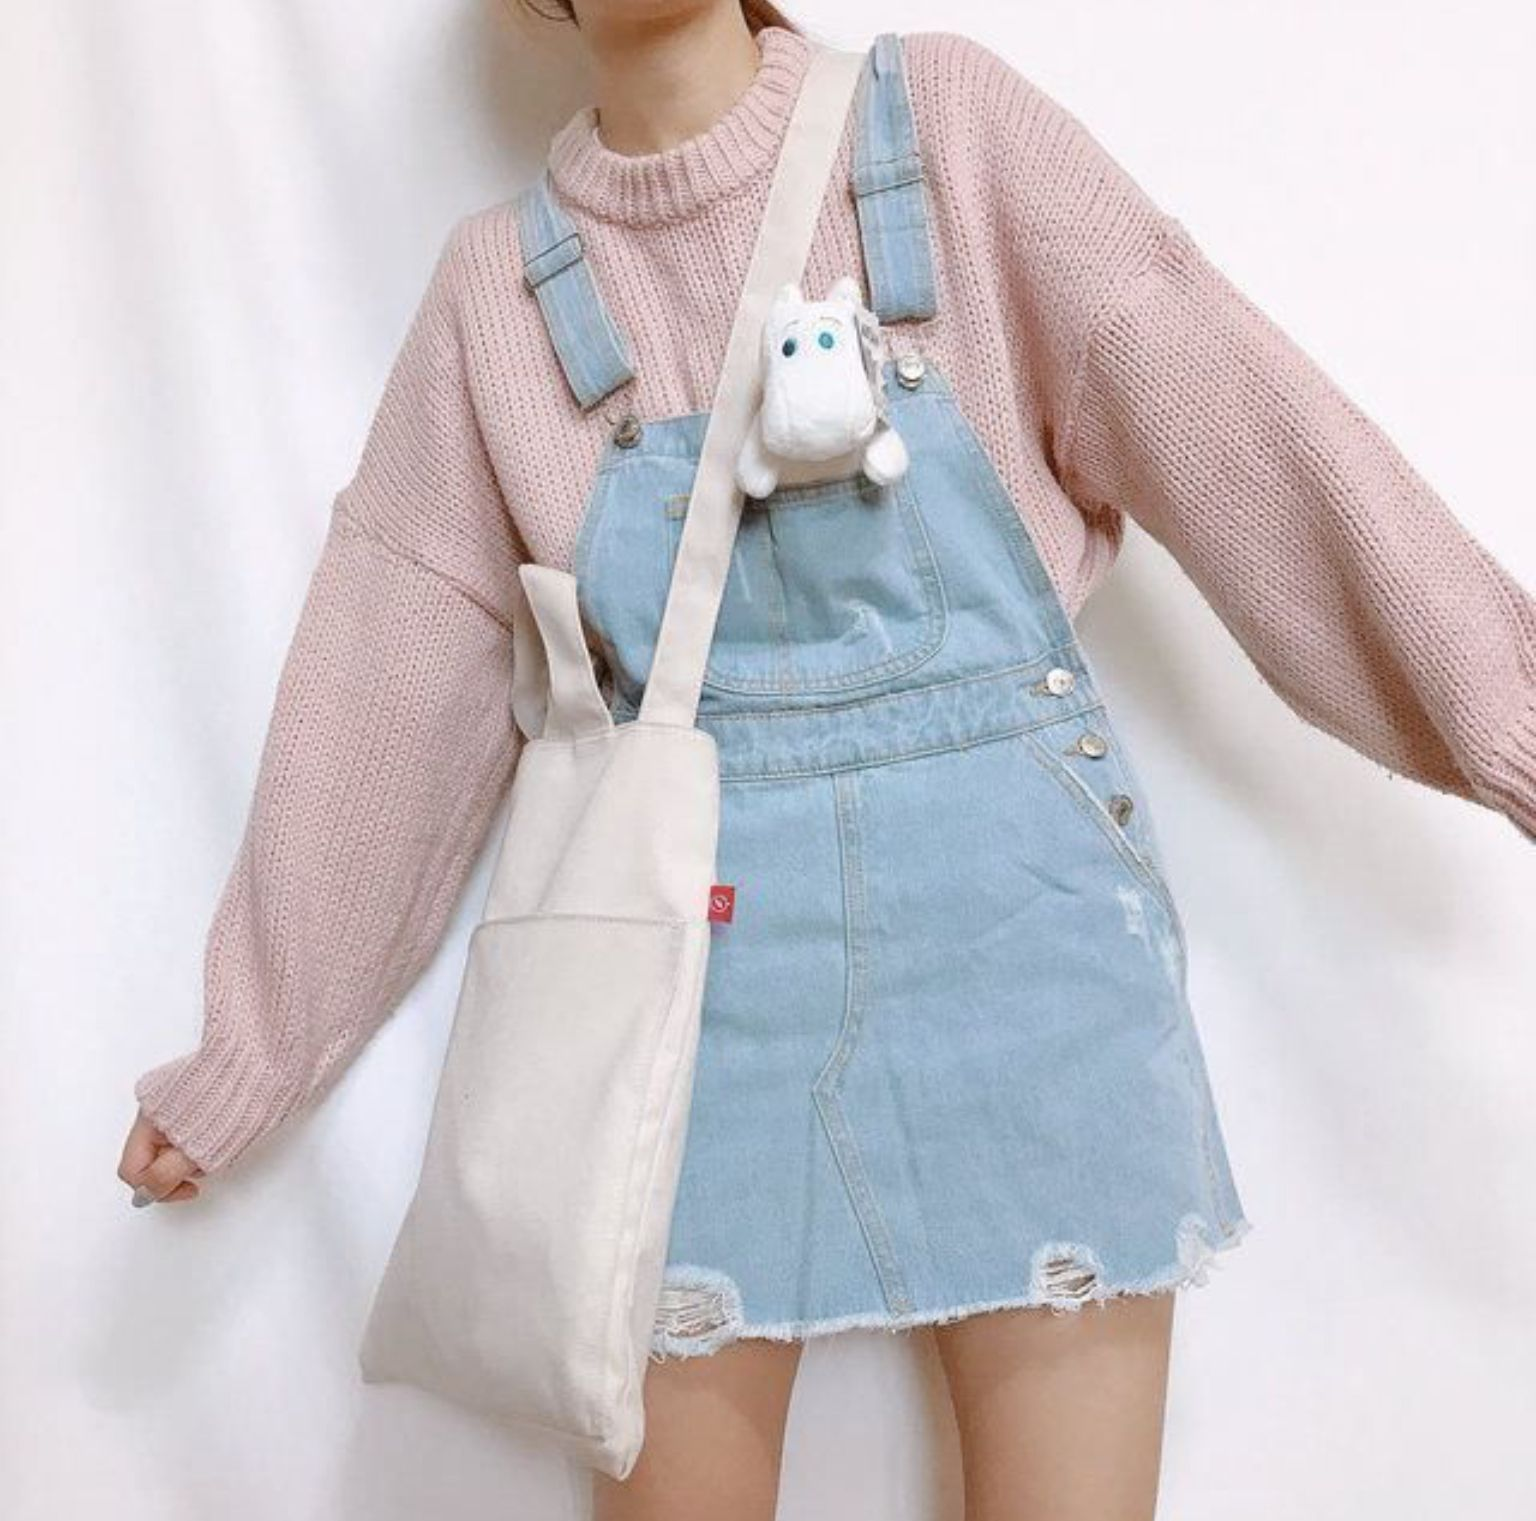 Clothes Fashion Kfashion Korean Fashion Style Street Style Cute Kawaii Soft Pastel Aesthetic Outfit In 2020 Kawaii Fashion Outfits Korean Fashion Trends Kawaii Clothes